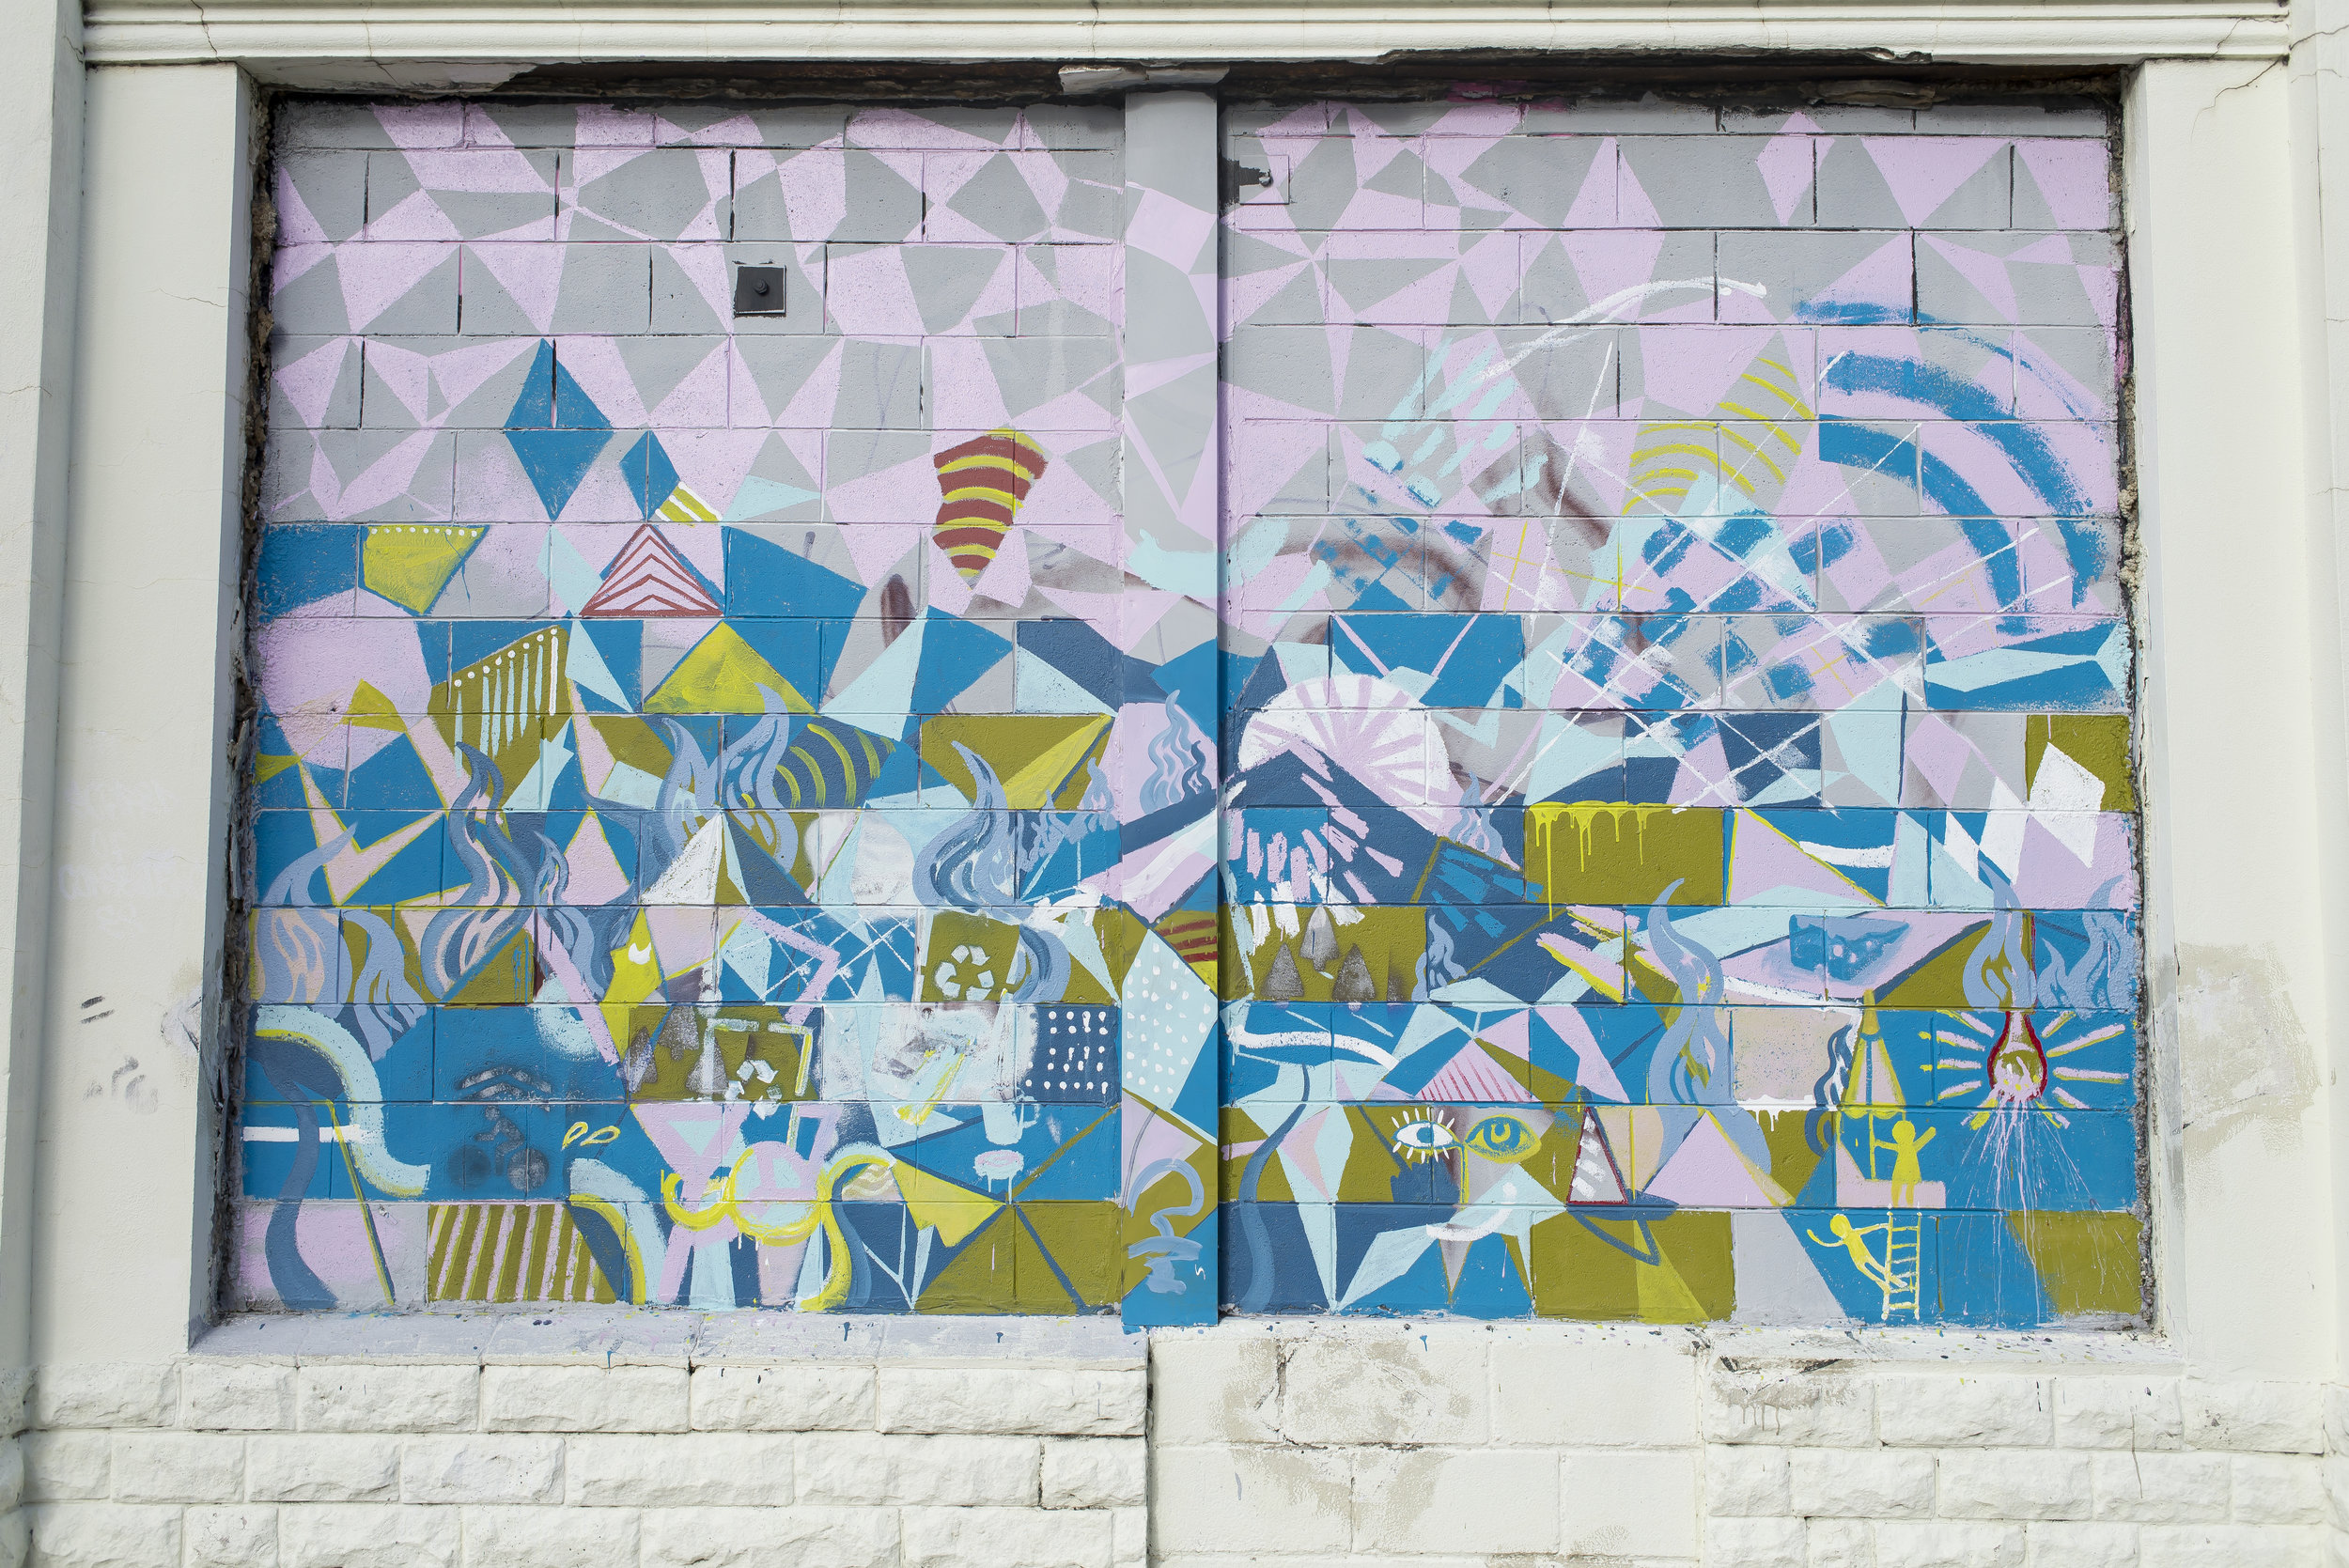 Wall art in Savannah's Starland District